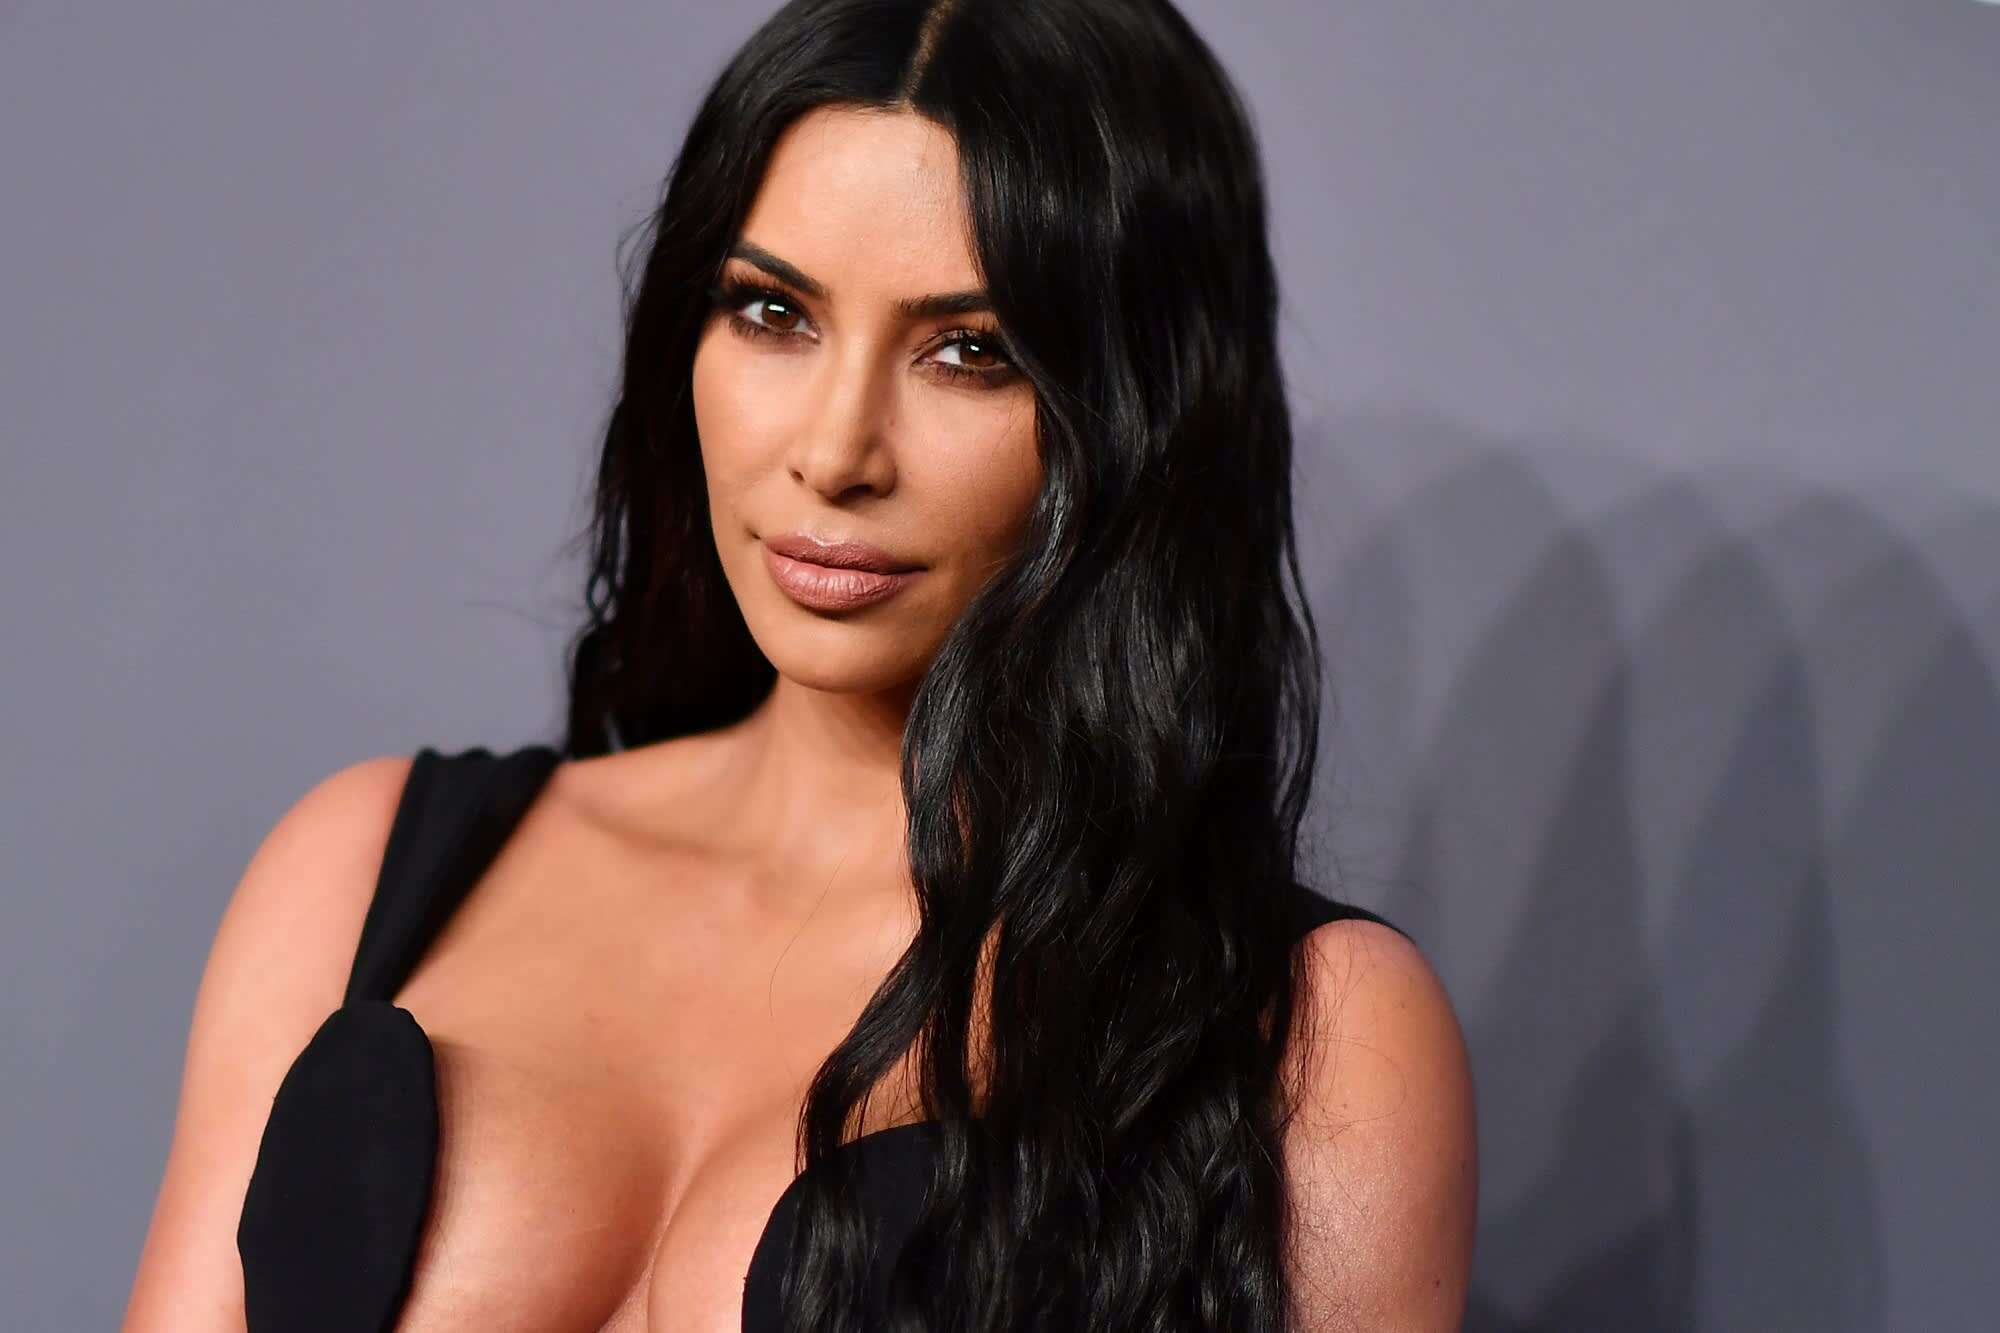 Kim Kardashian Announces A Collaboration Between Skims And Fendi